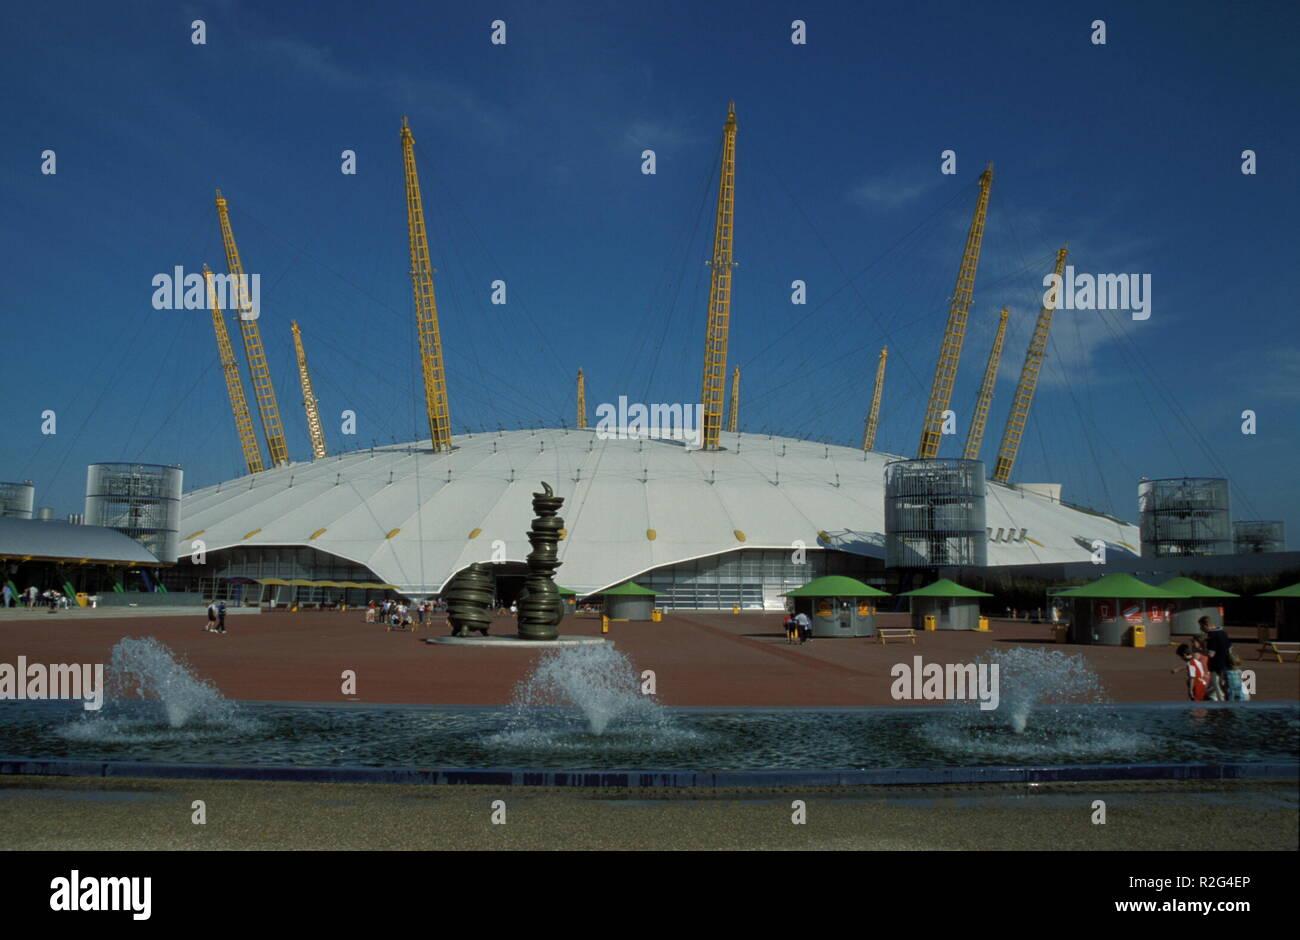 Millennium Dome 2 Photo Stock